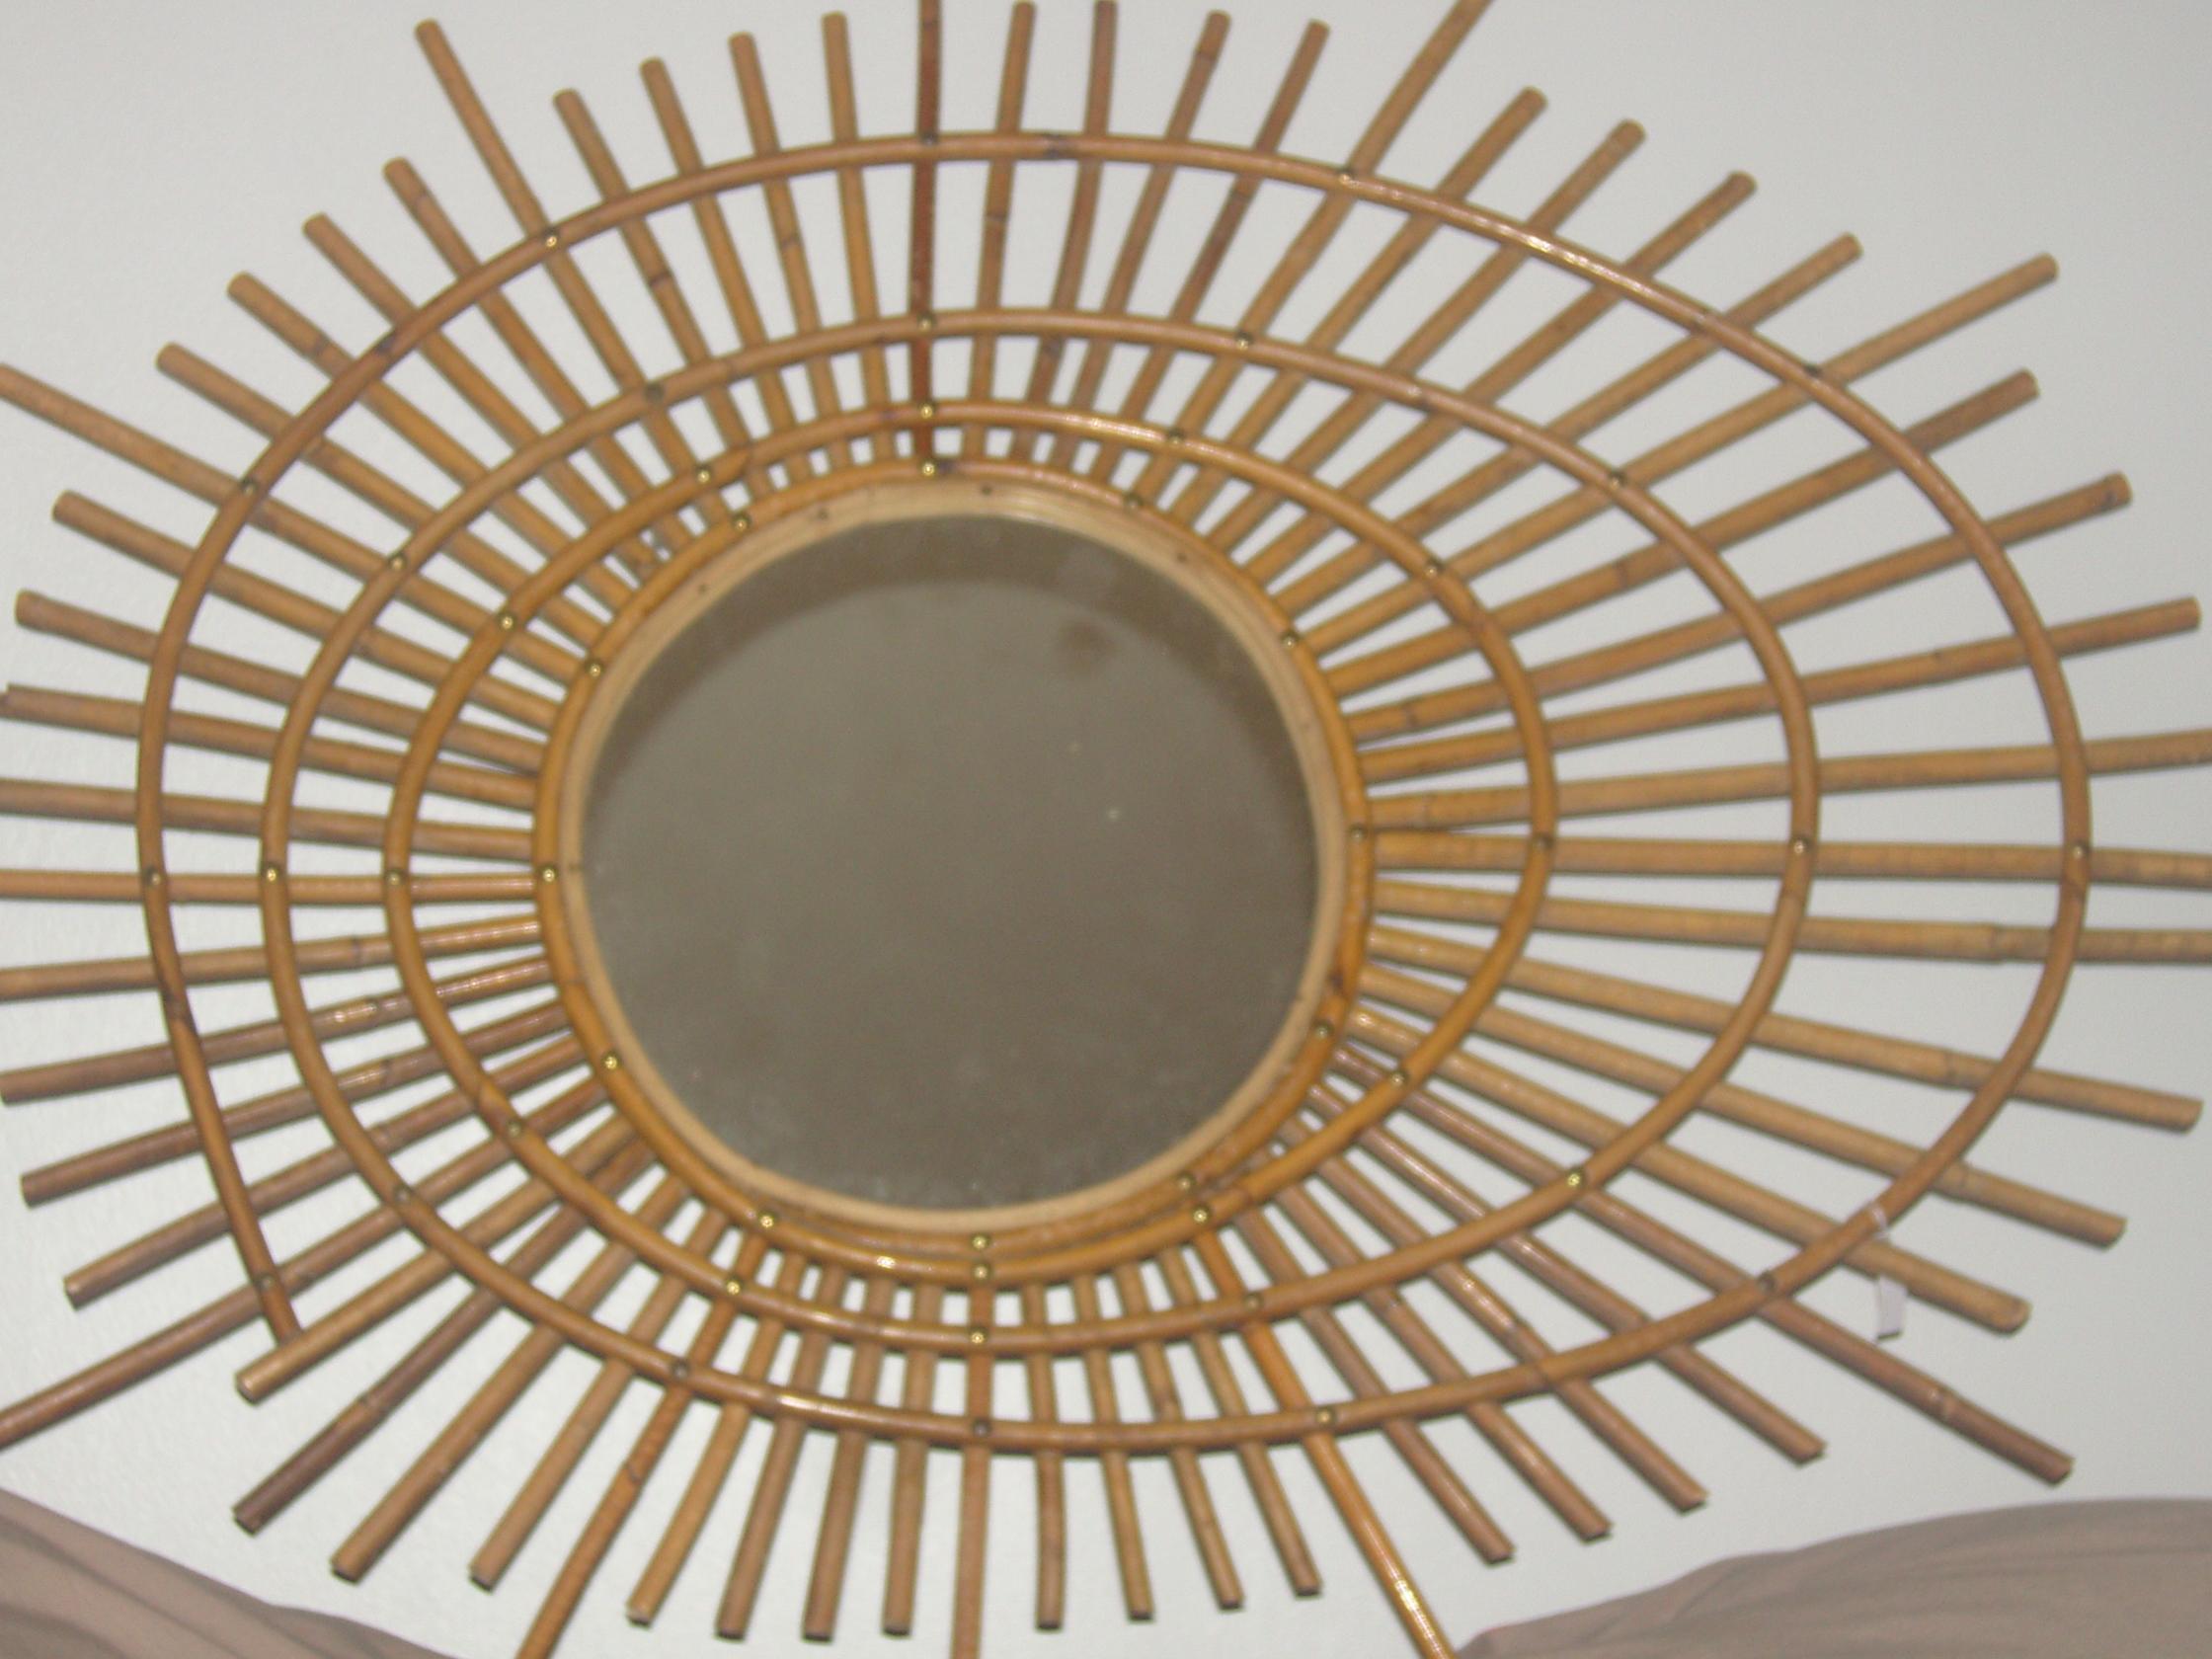 Miroir en osier rotin des ann es 50 60 for Miroir osier